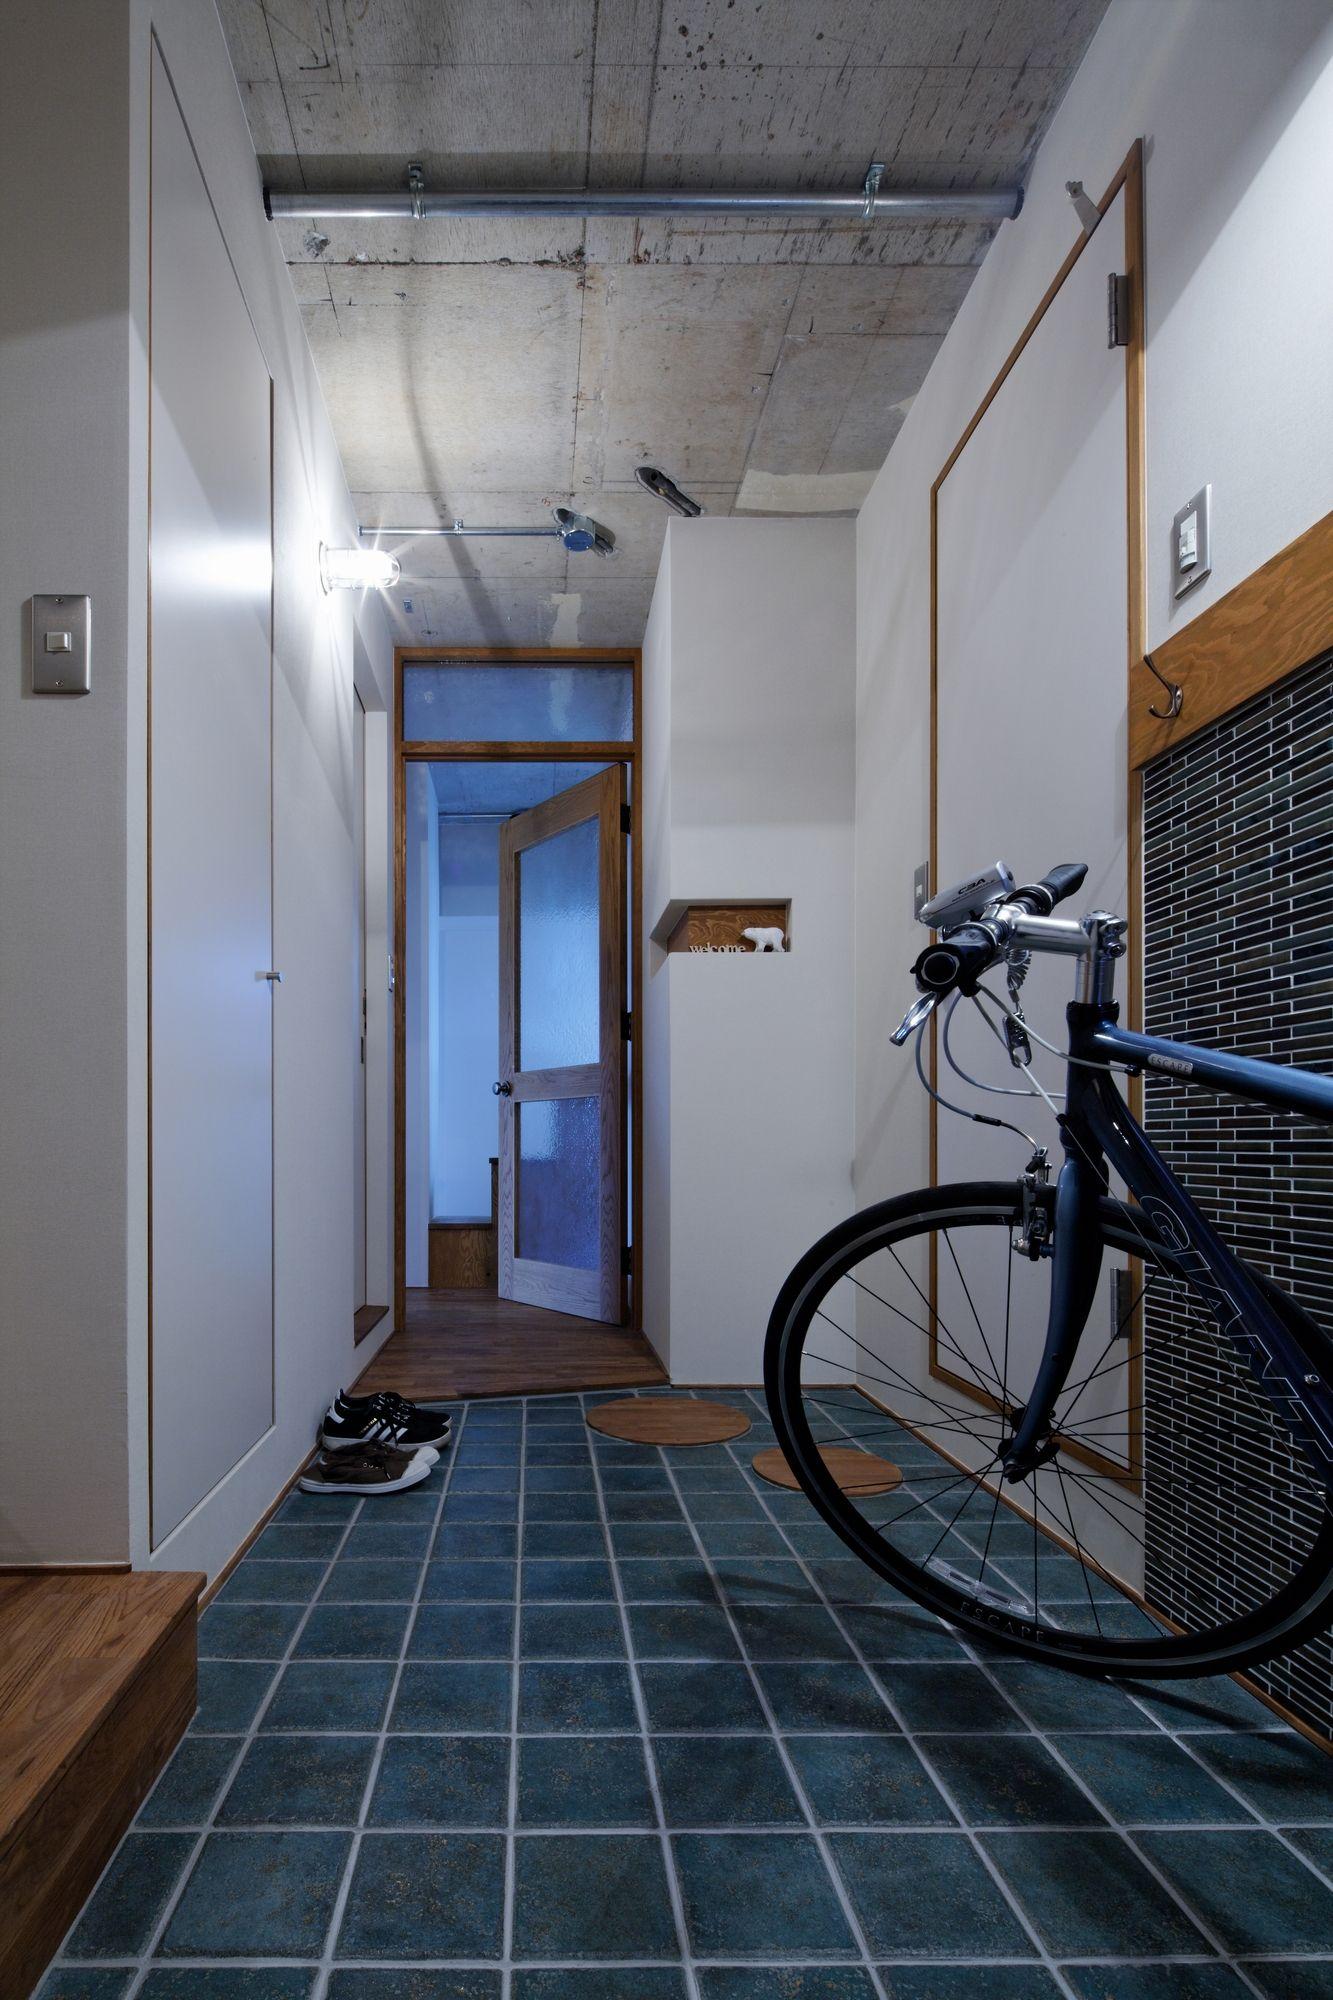 Renovation Mansion おしゃれまとめの人気アイデア Pinterest Natsu Komi リノベーション リフォーム 玄関 玄関 デザイン